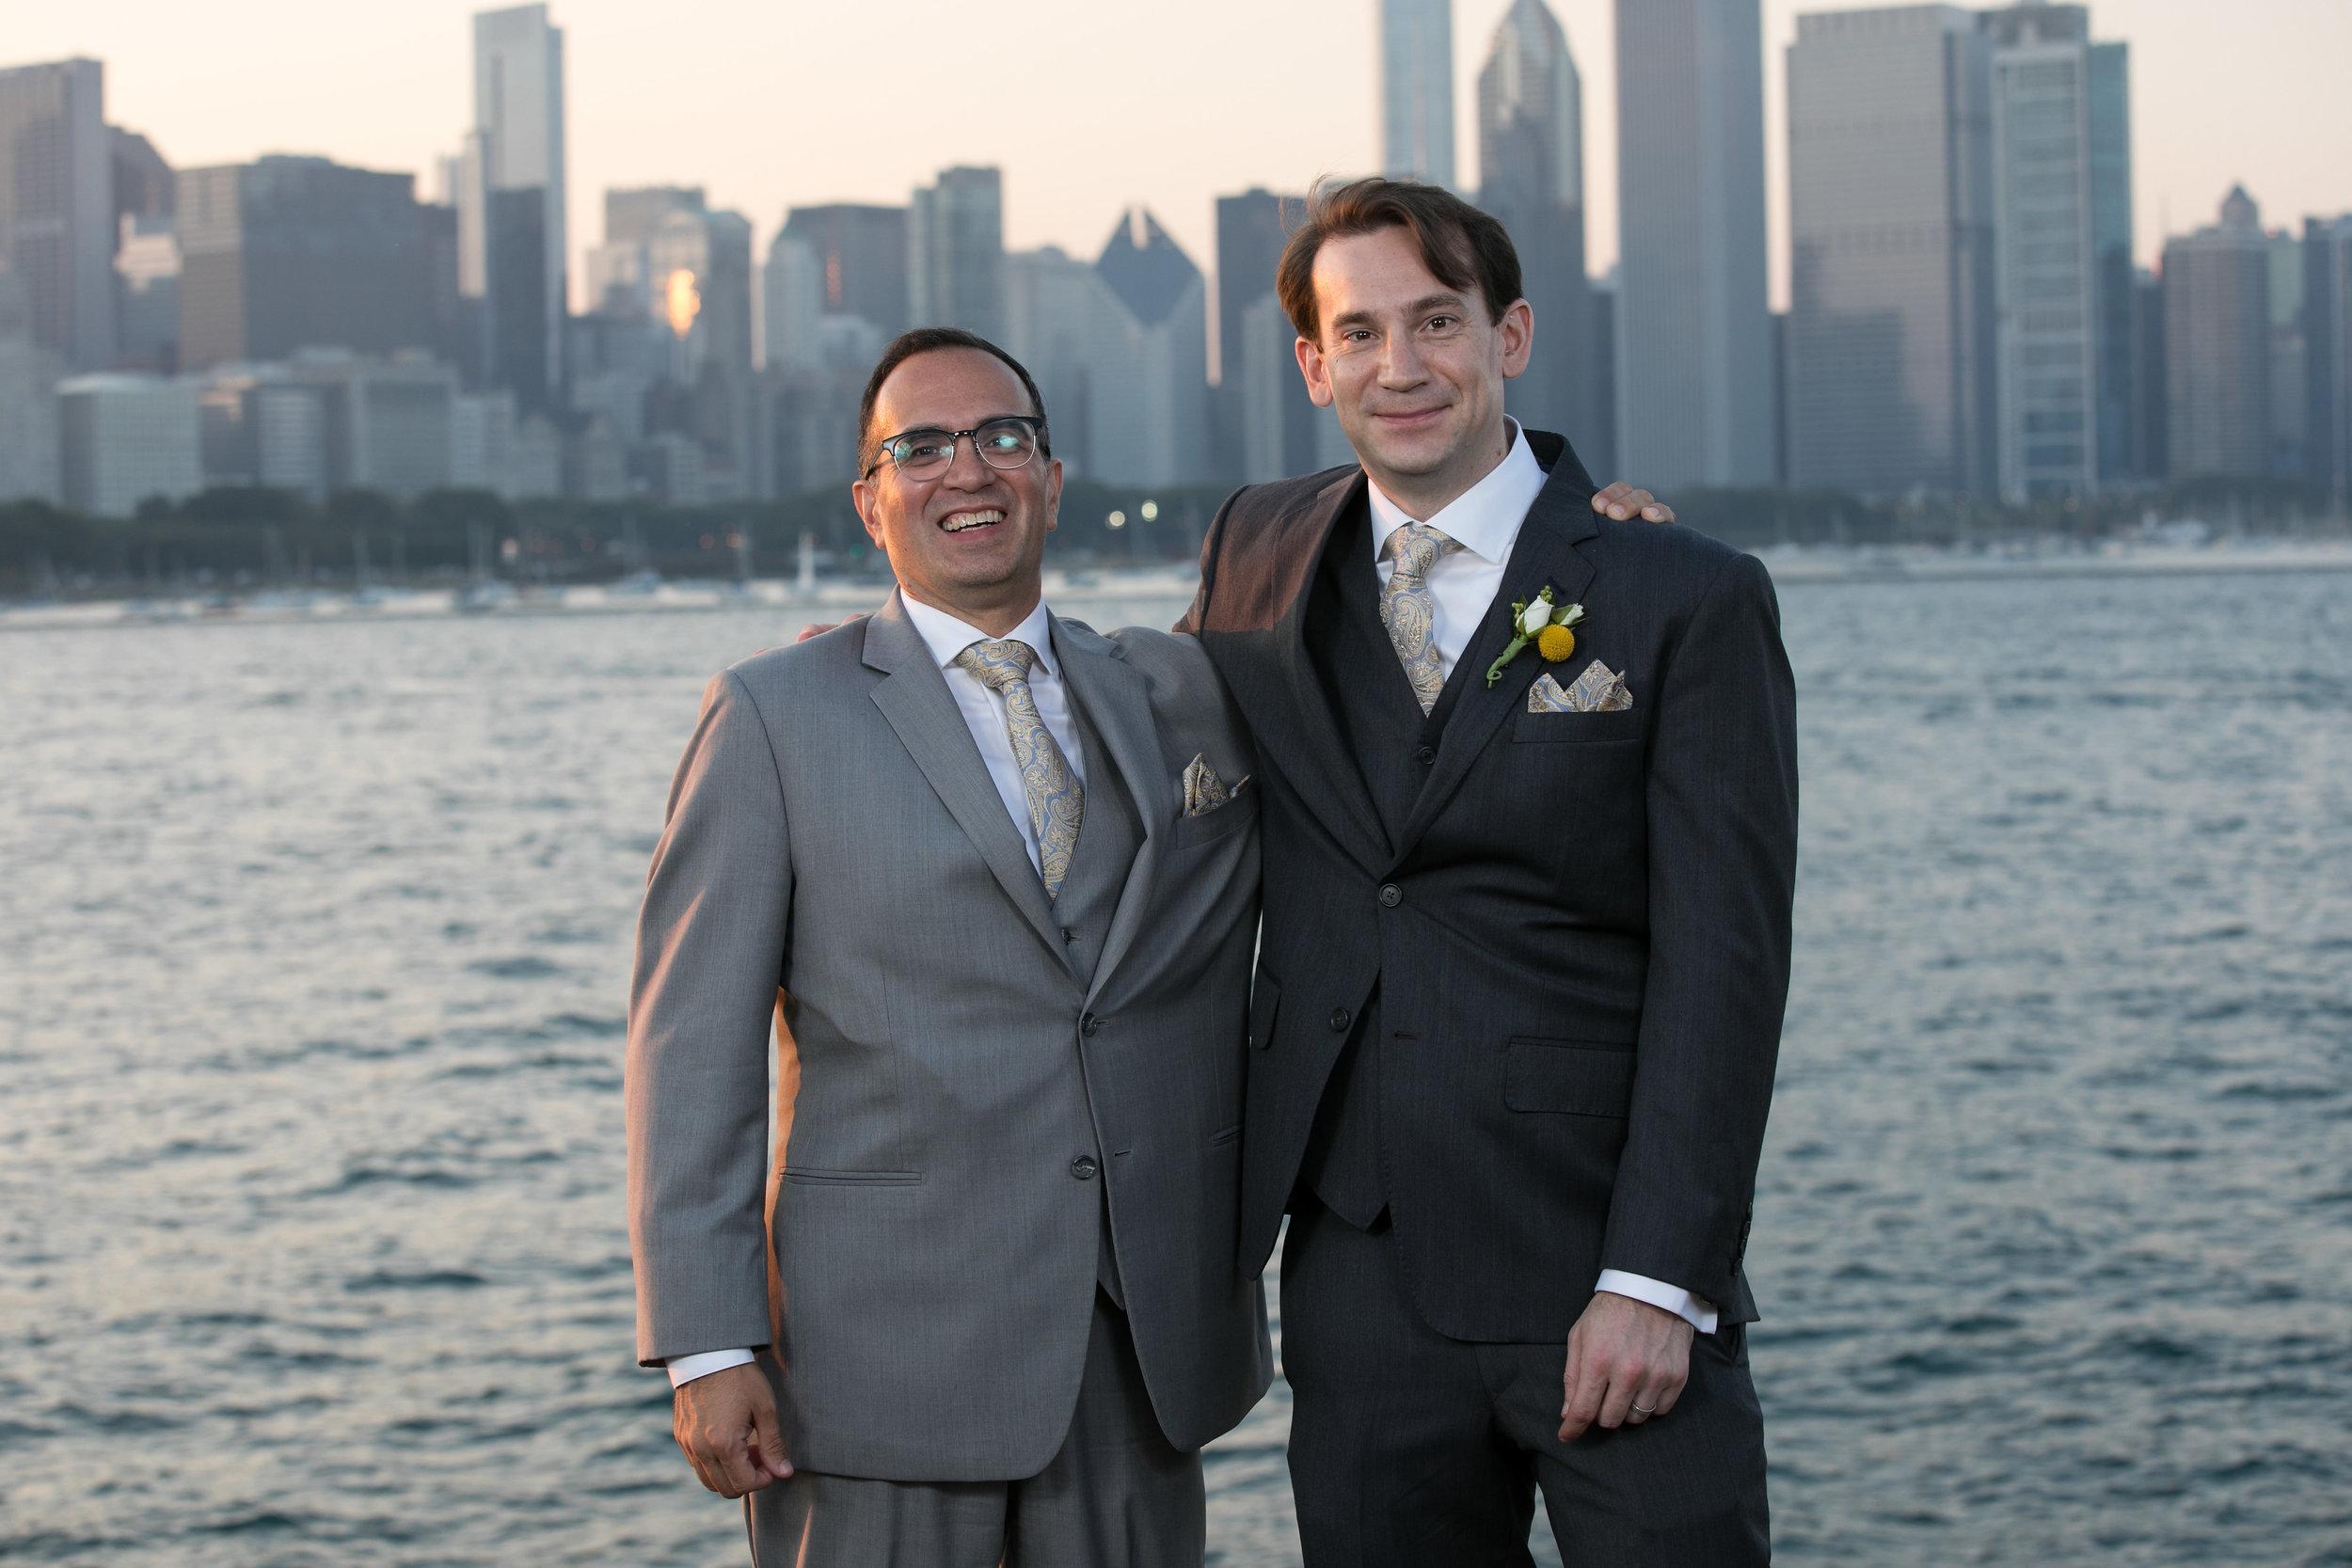 Jared_and_Elena_472.jpg